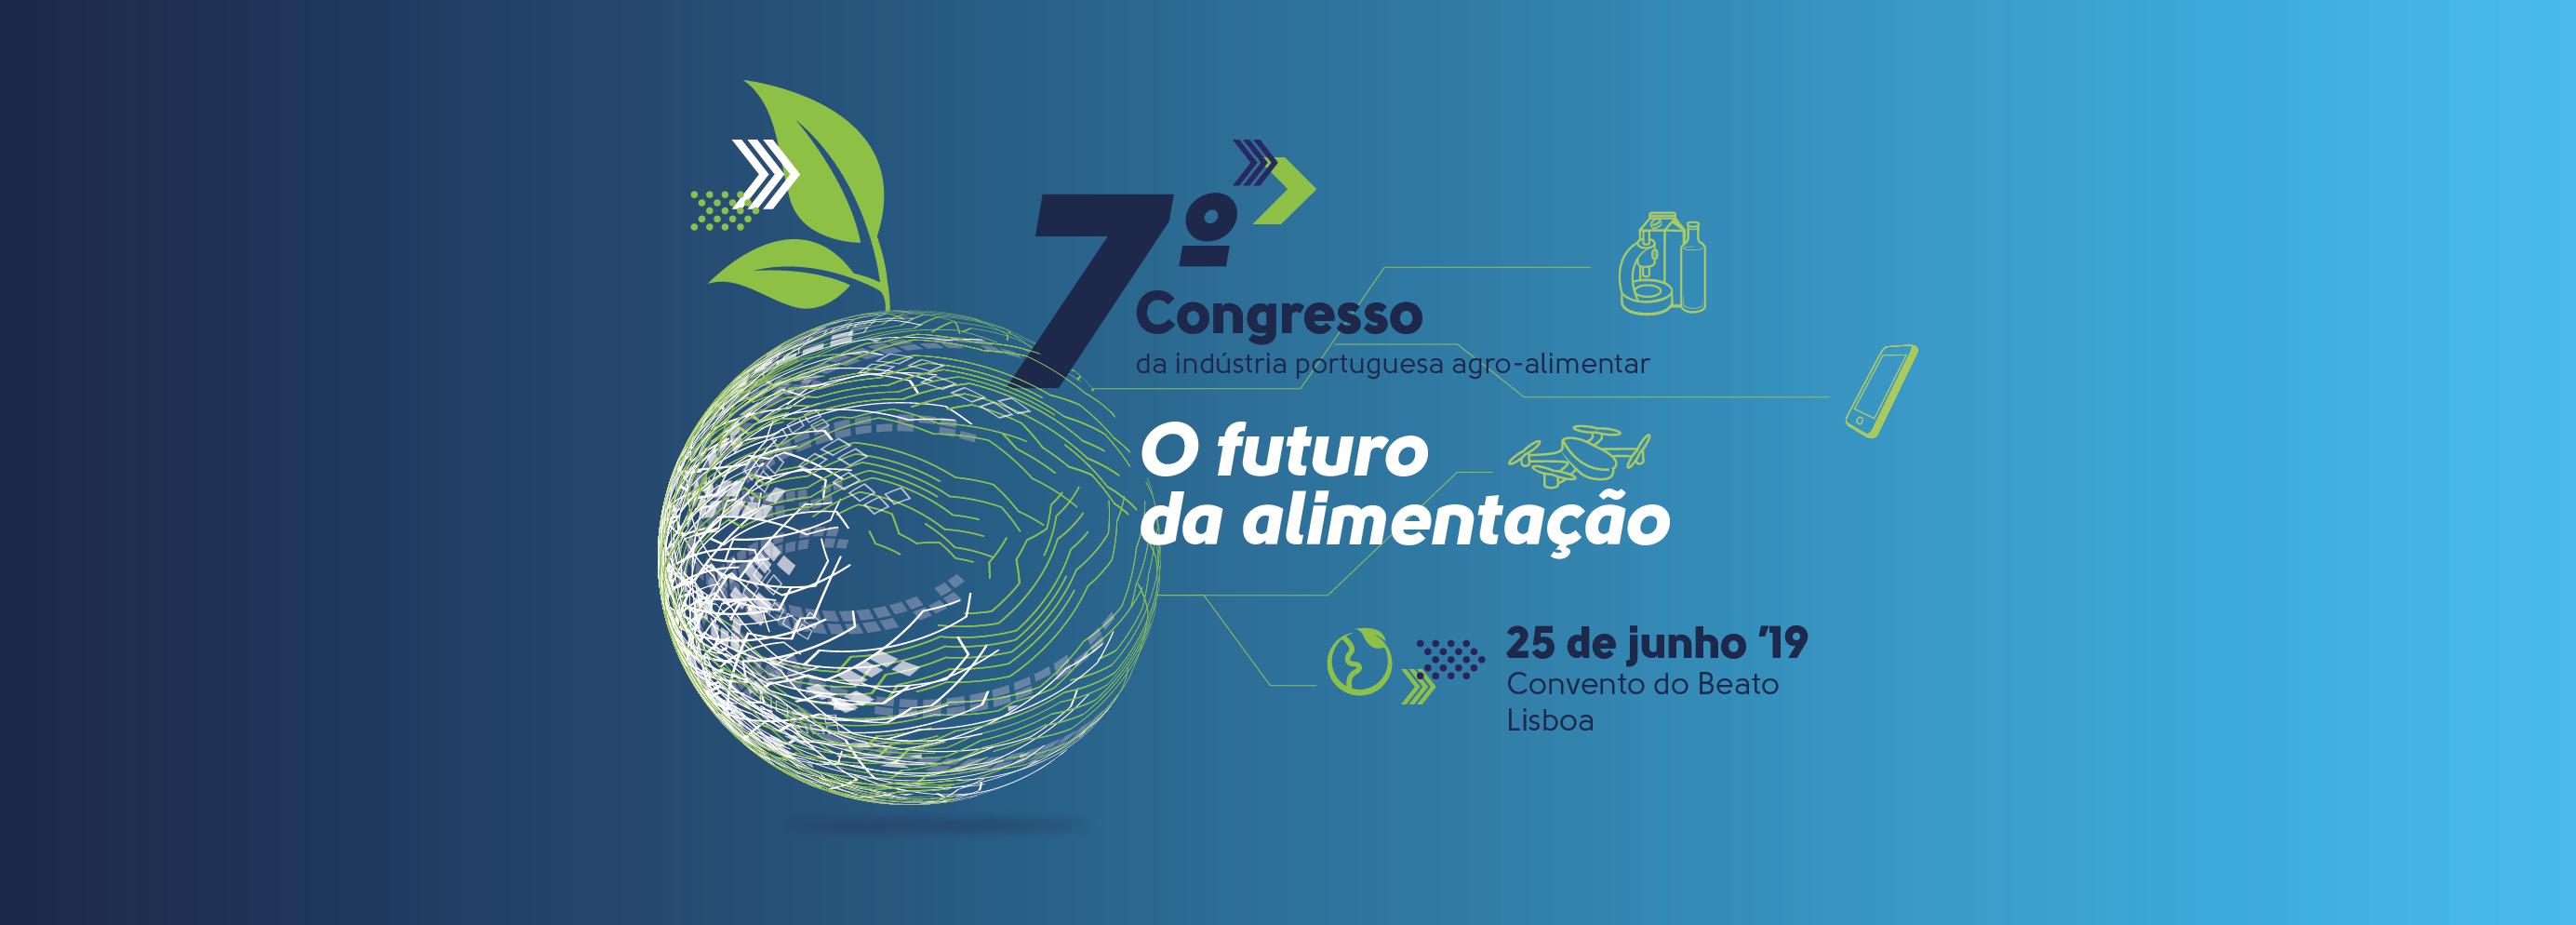 7 Congresso